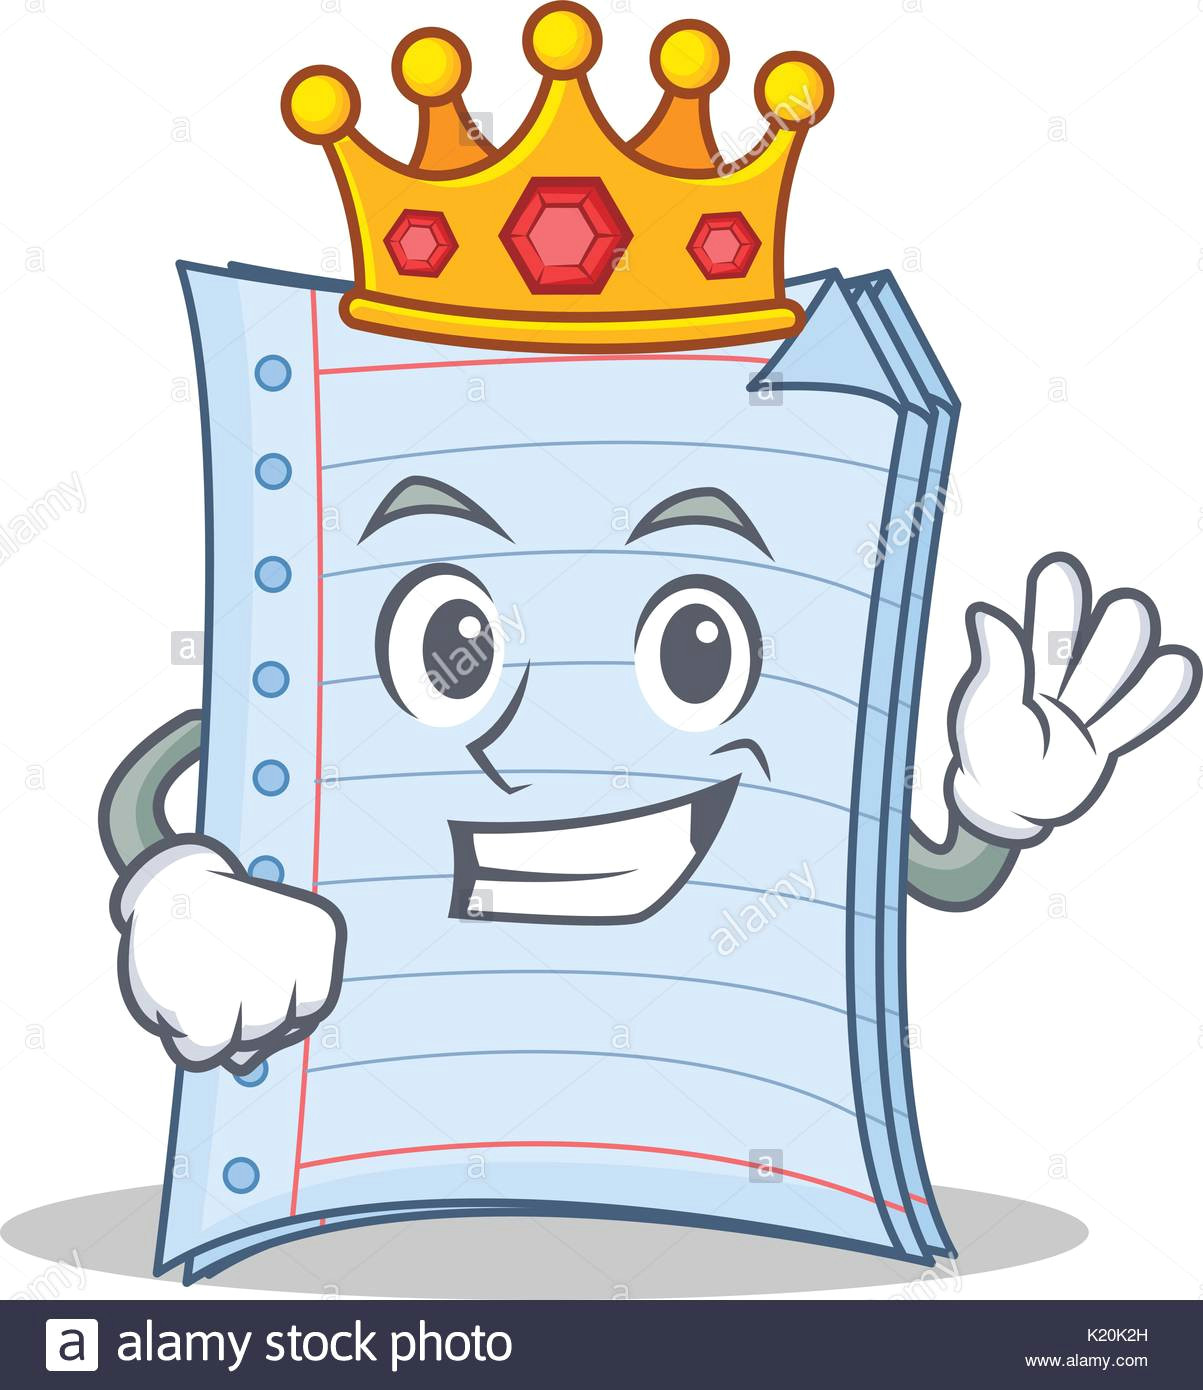 king notebook character cartoon design